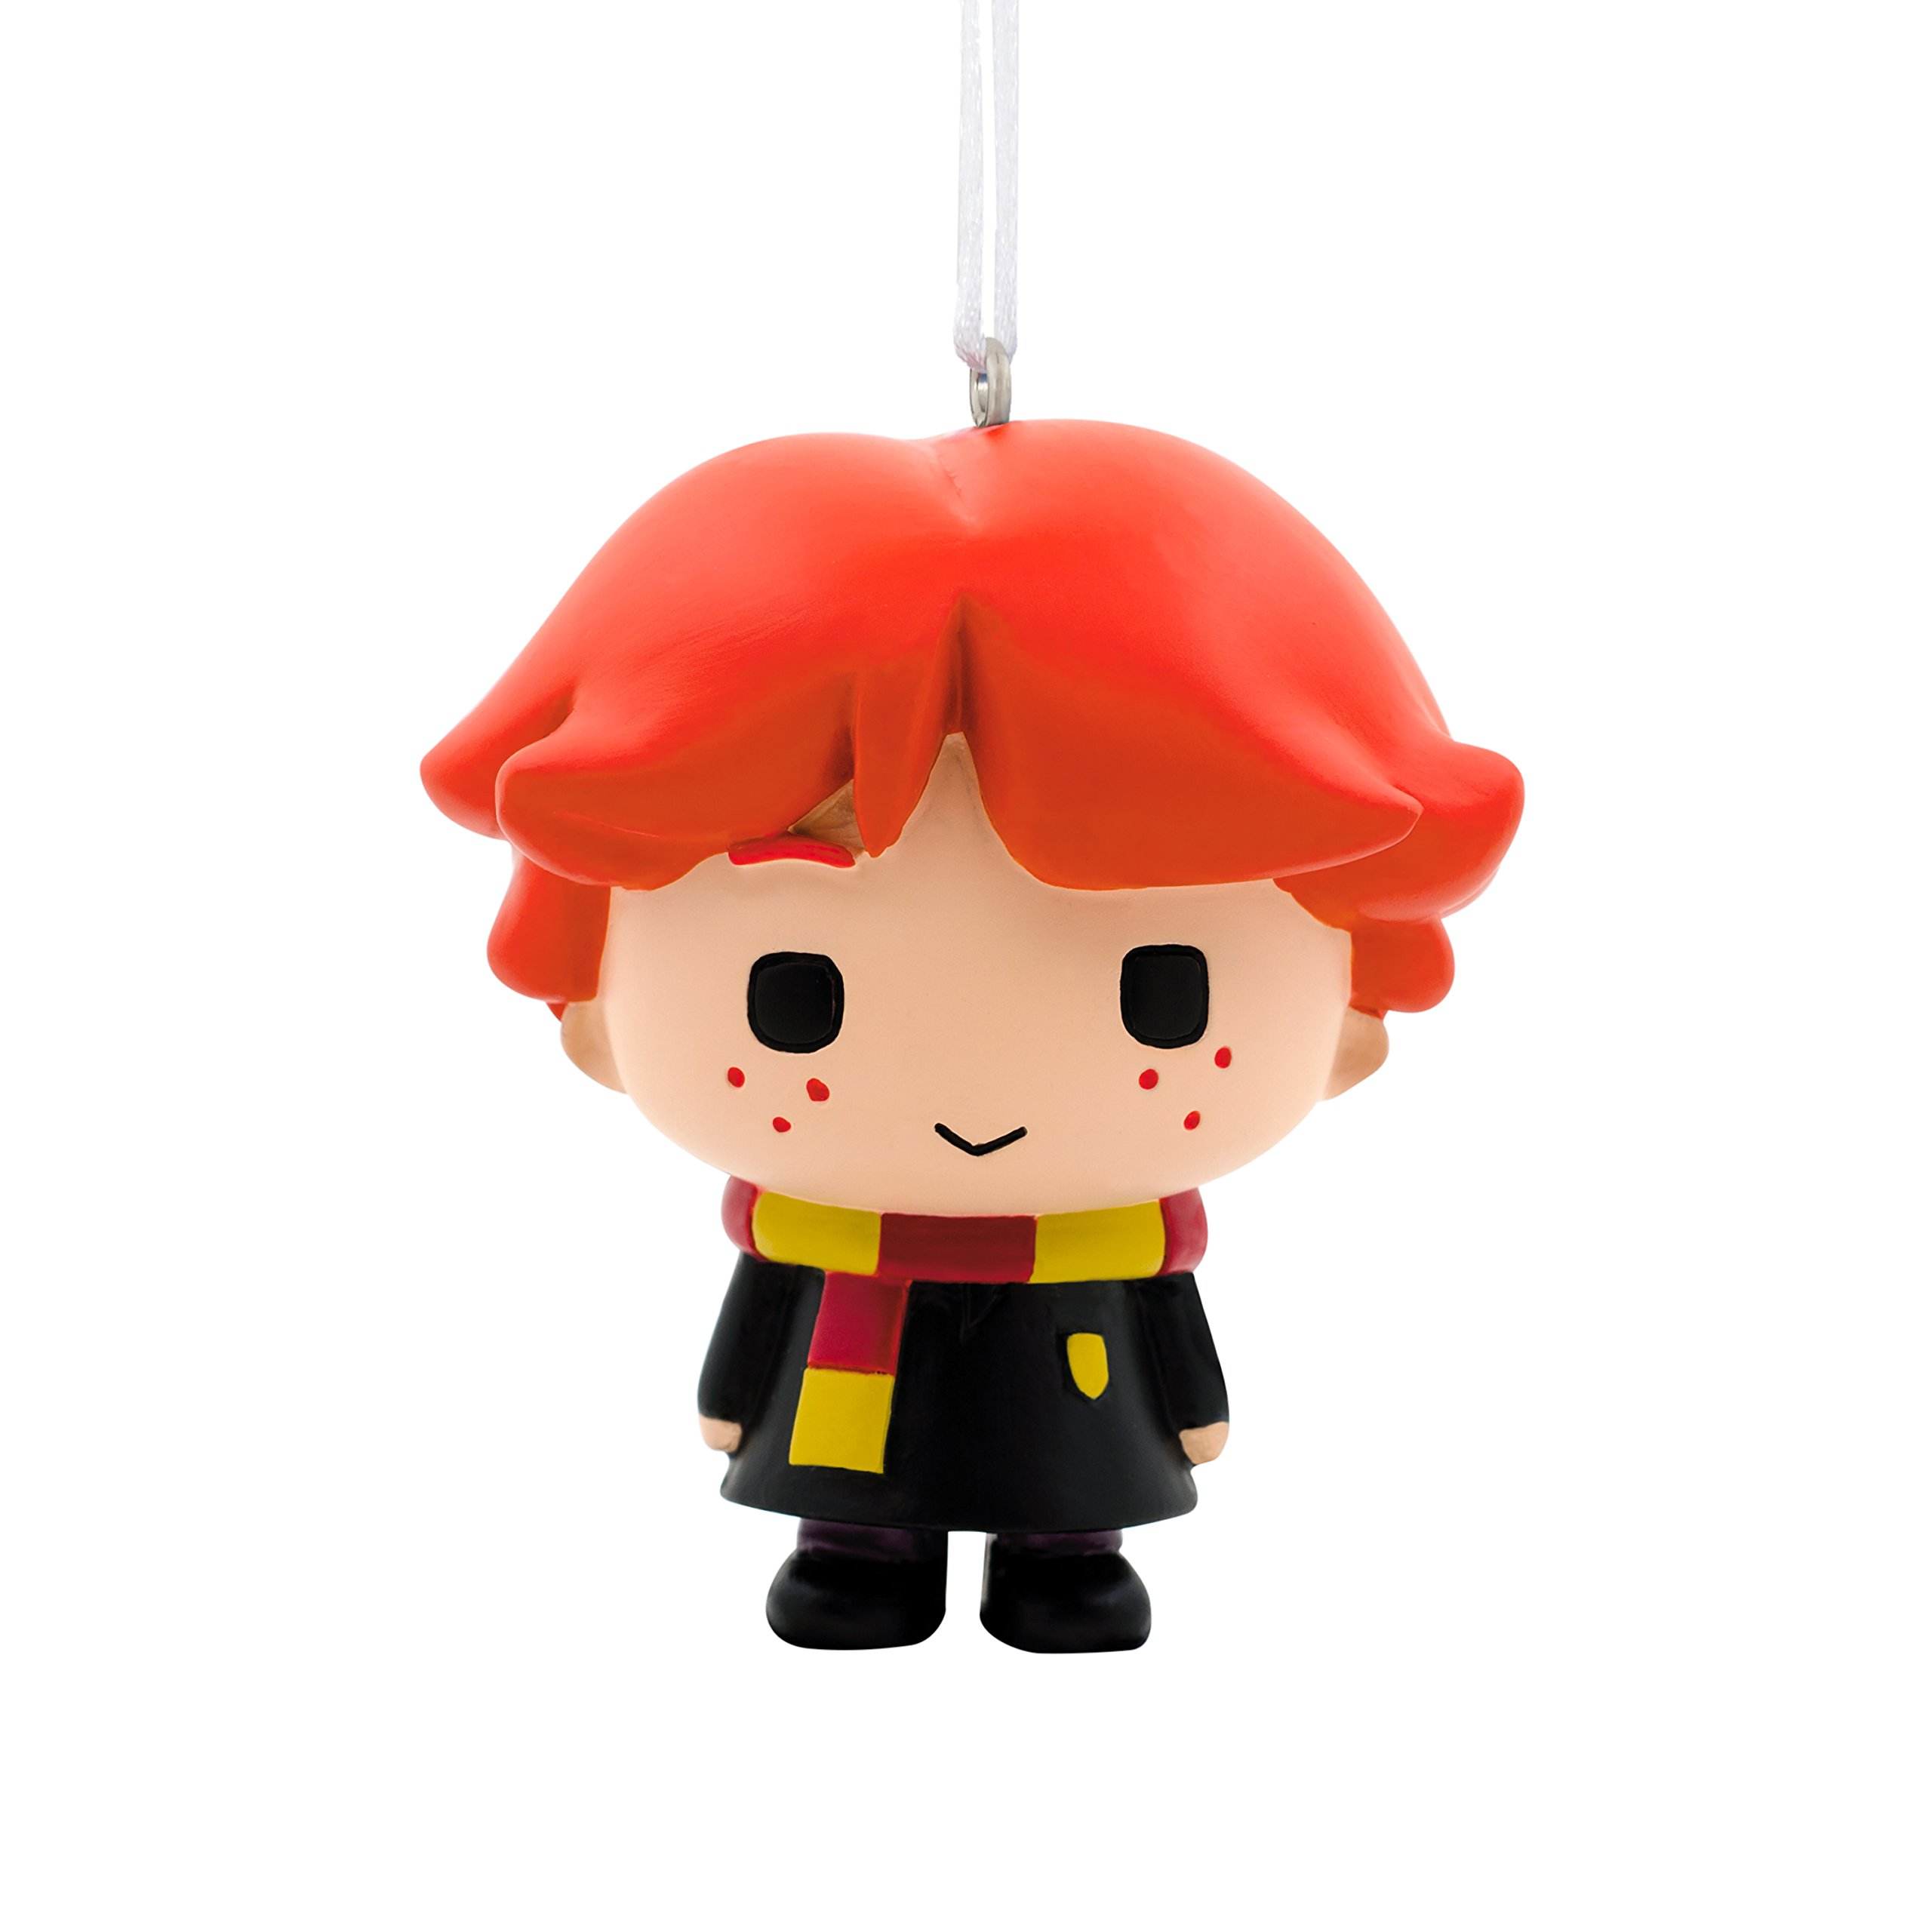 Hallmark Harry Potter Ron Weasley Ornament Movies & TV